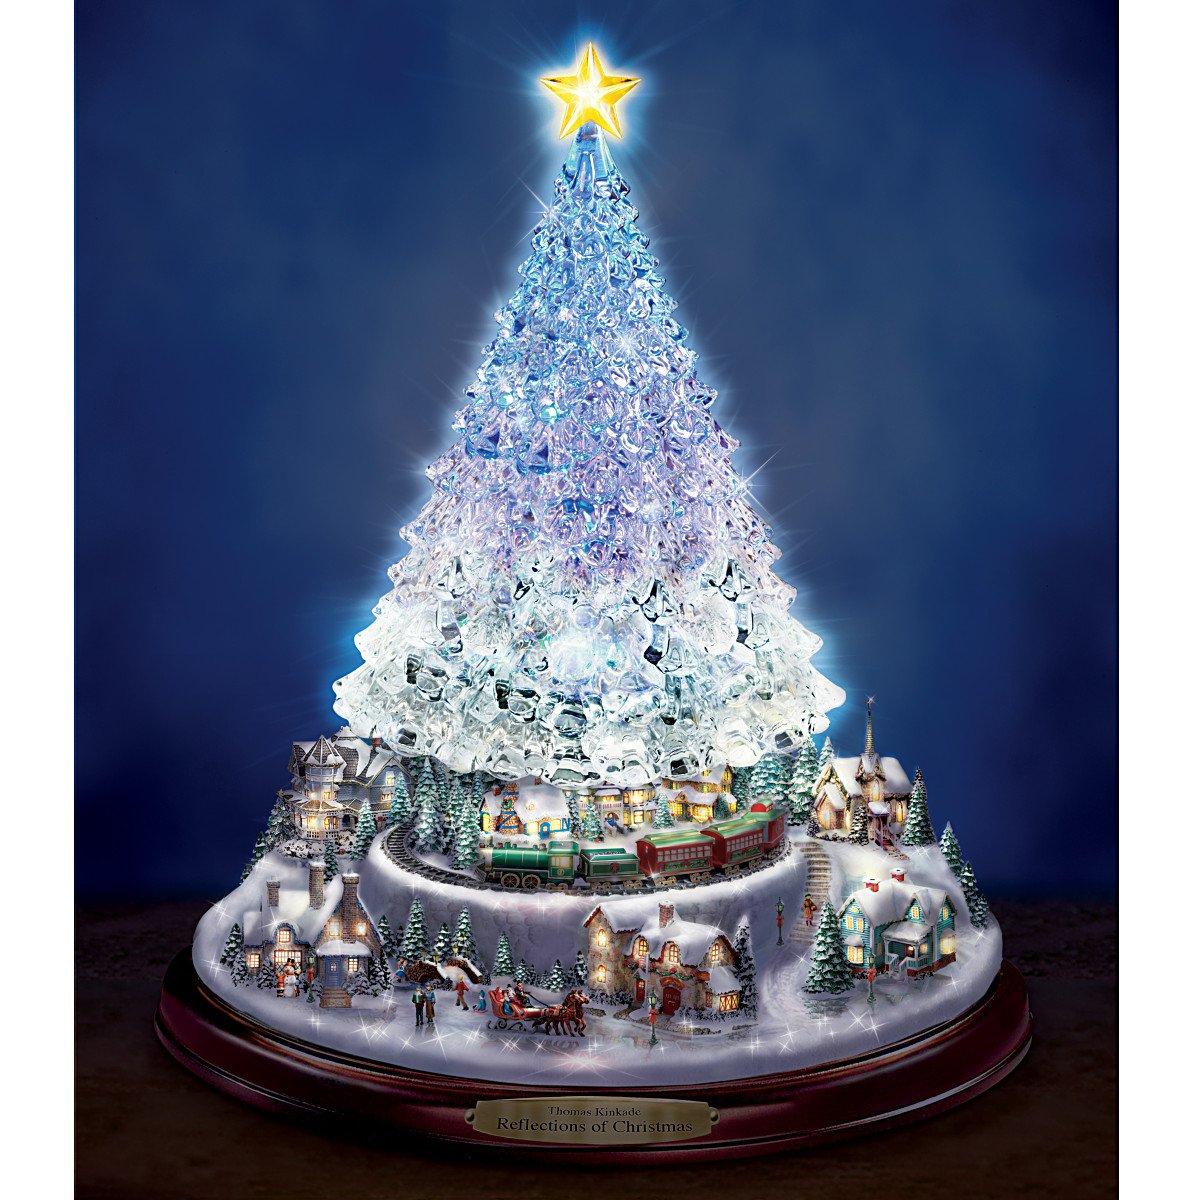 Kinkade christmas ornaments - Amazon Com Thomas Kinkade Crystal Tabletop Christmas Tree Lights Motion And Music By The Bradford Exchange Home Kitchen